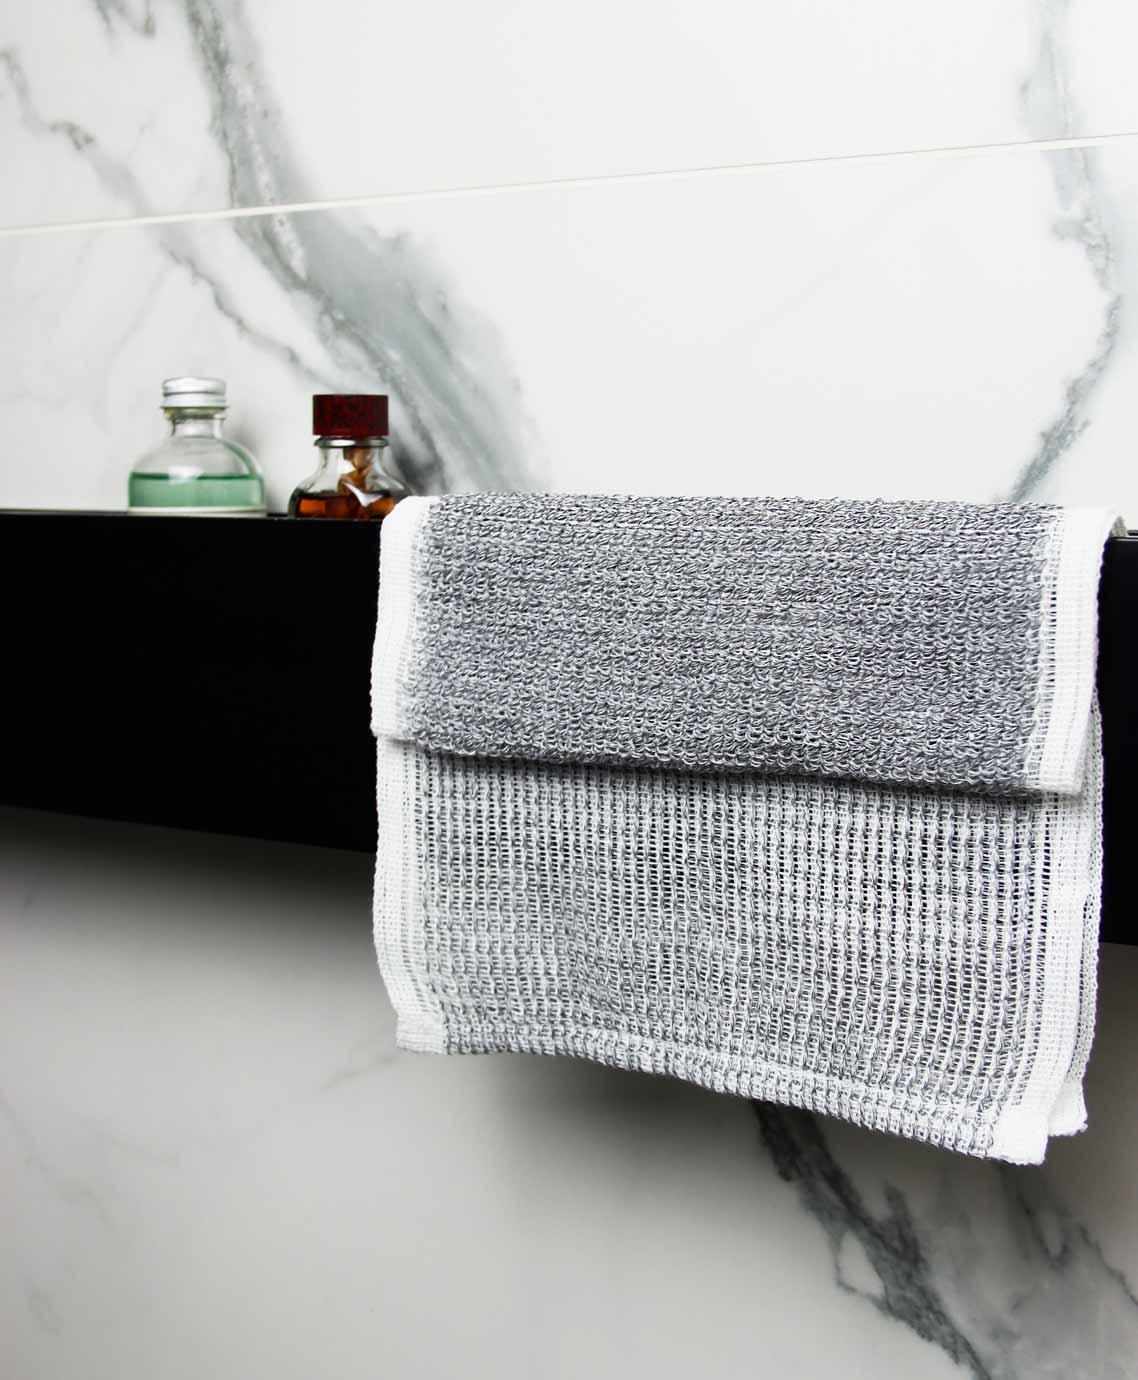 Peeling Towel - Kenkawai - at RAUM concept store